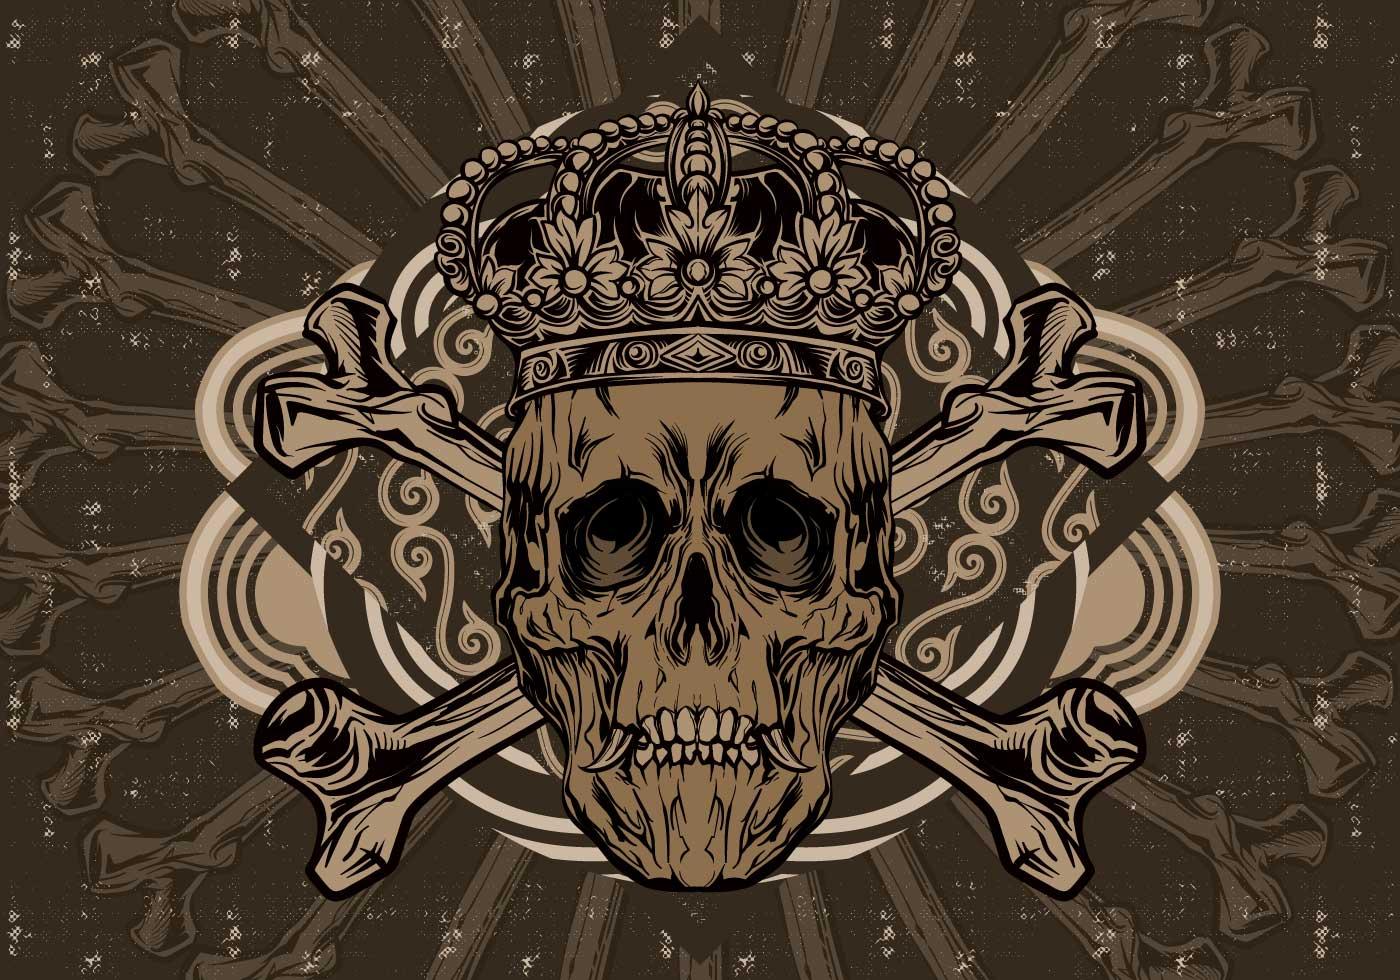 Skeleton Pattern Wallpaper Cute Crown Skull Vector Download Free Vector Art Stock